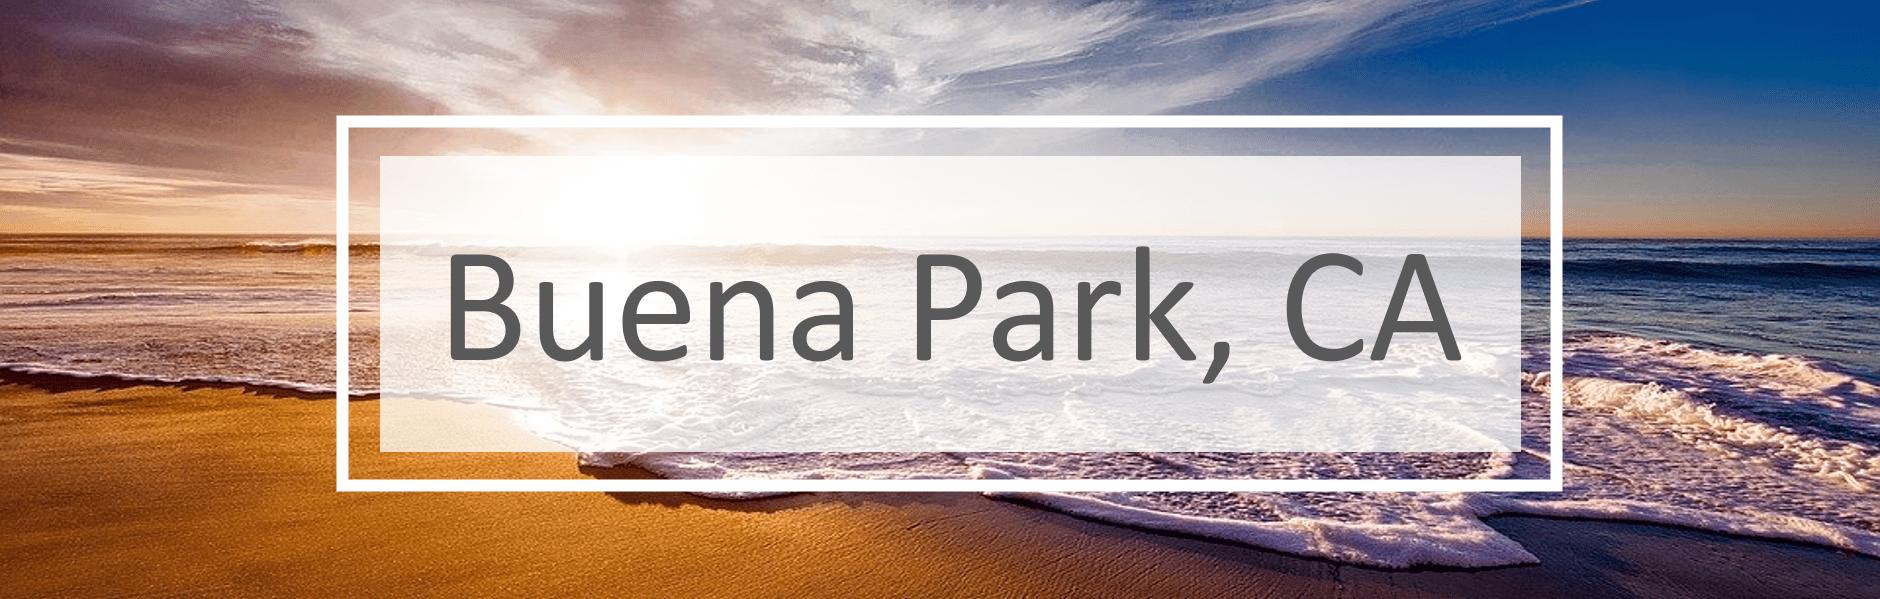 Buena Park sign